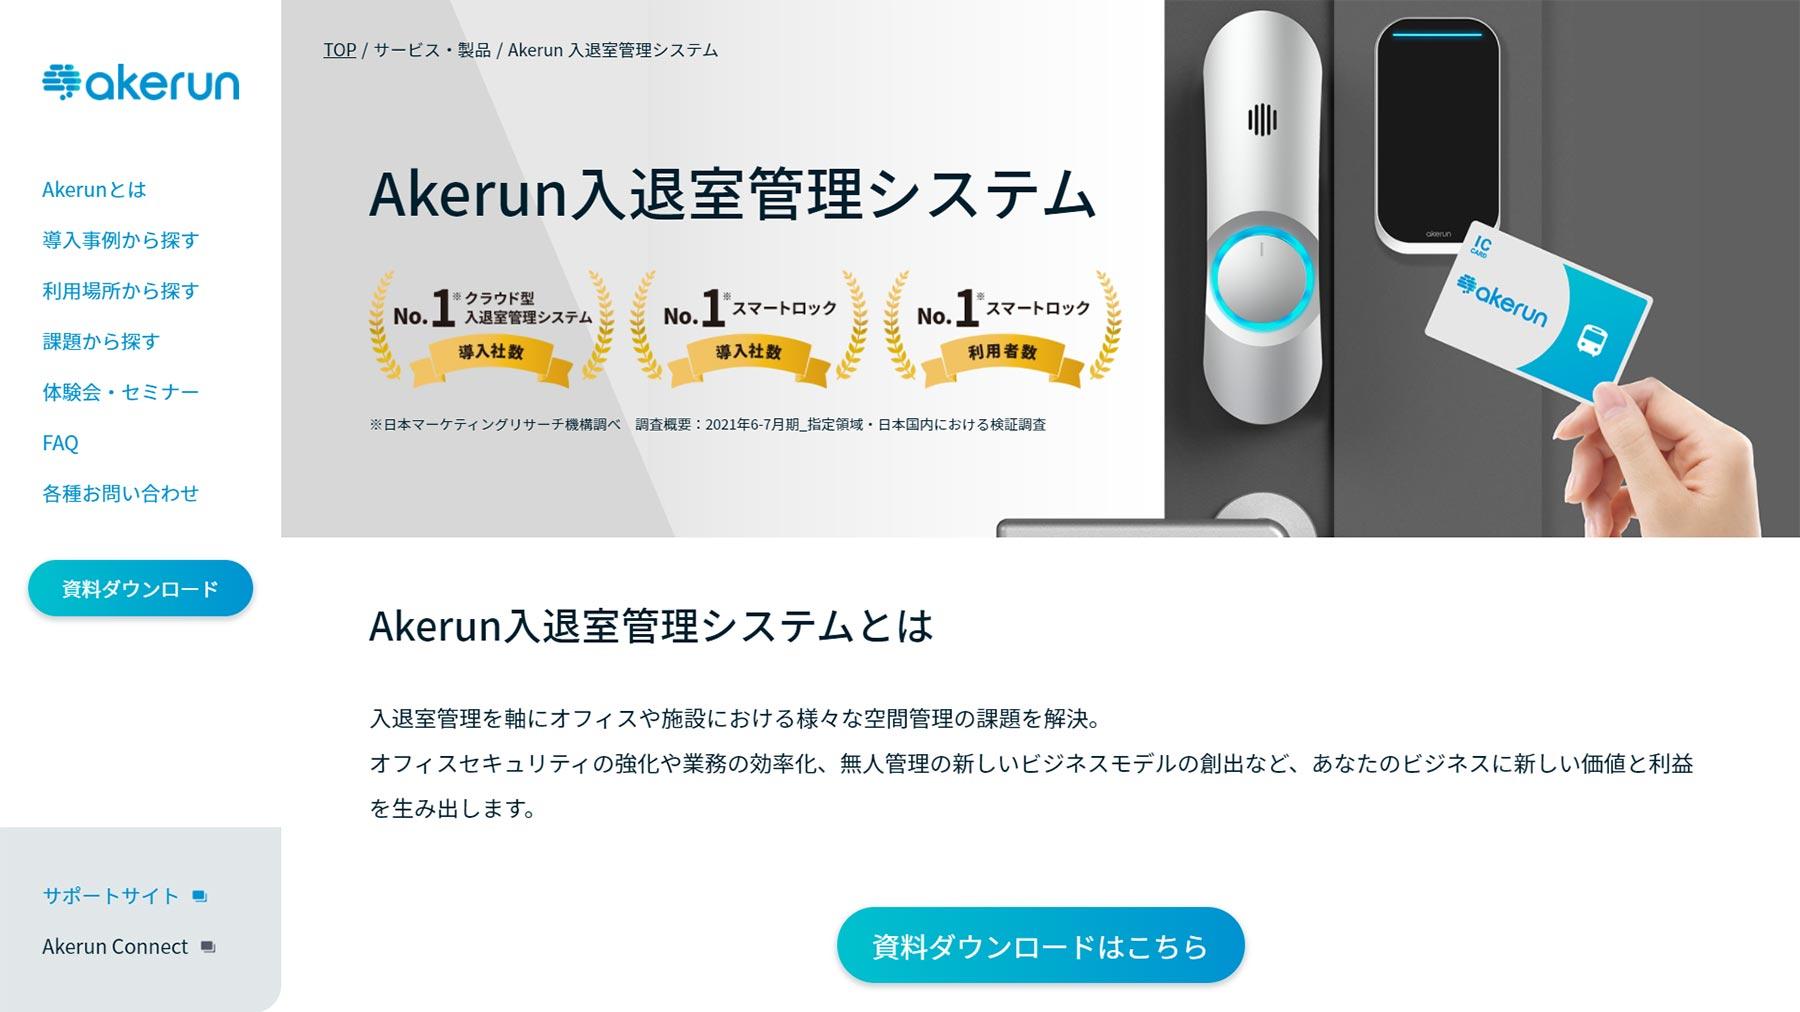 Akerun入退室管理システム